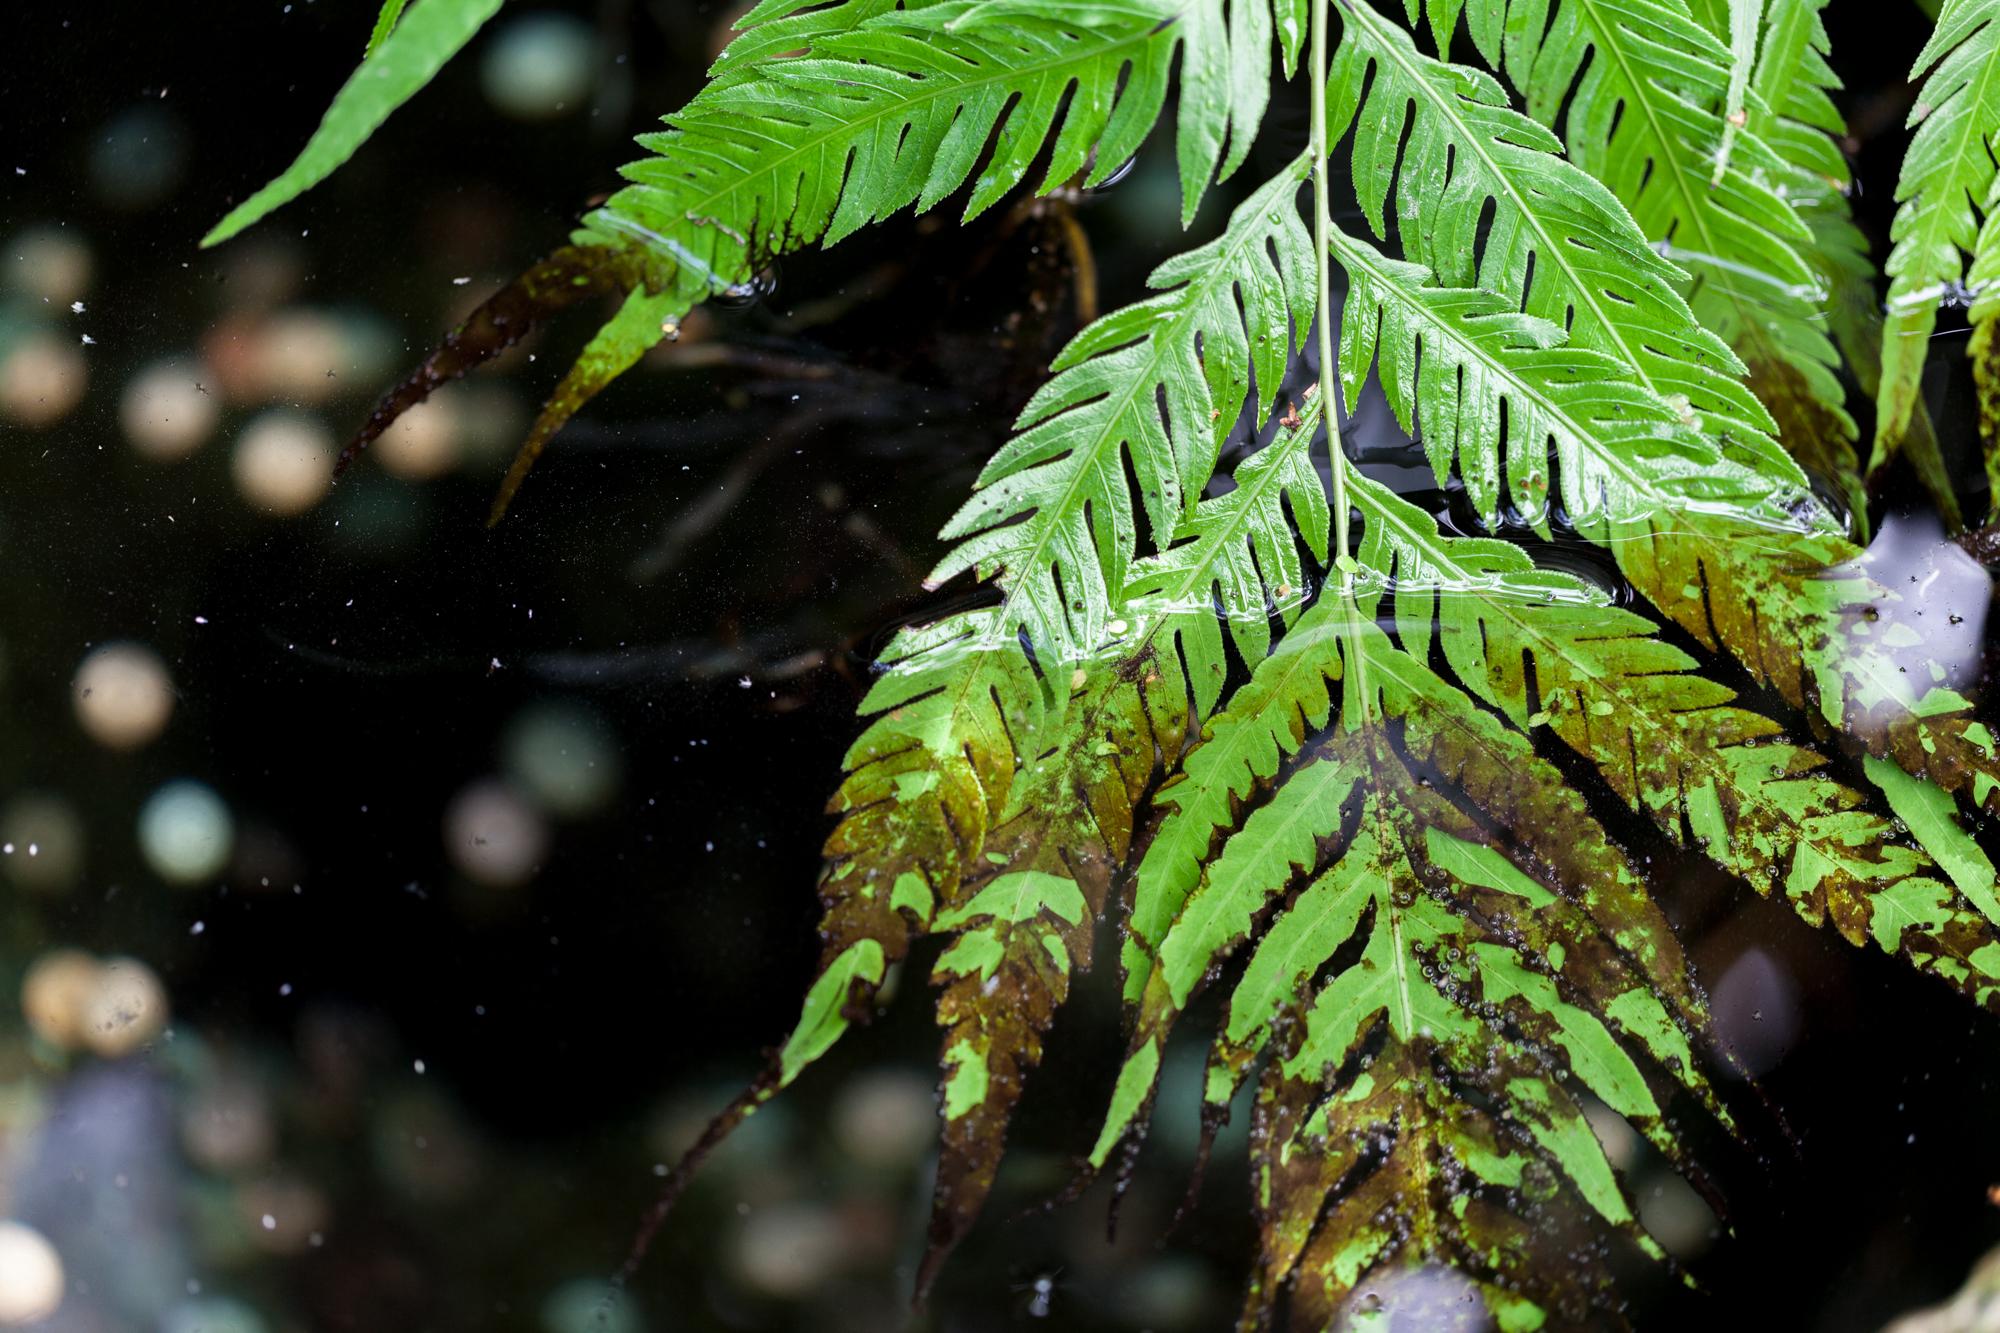 fern-in-water-volunteer-park-conservatory.jpg